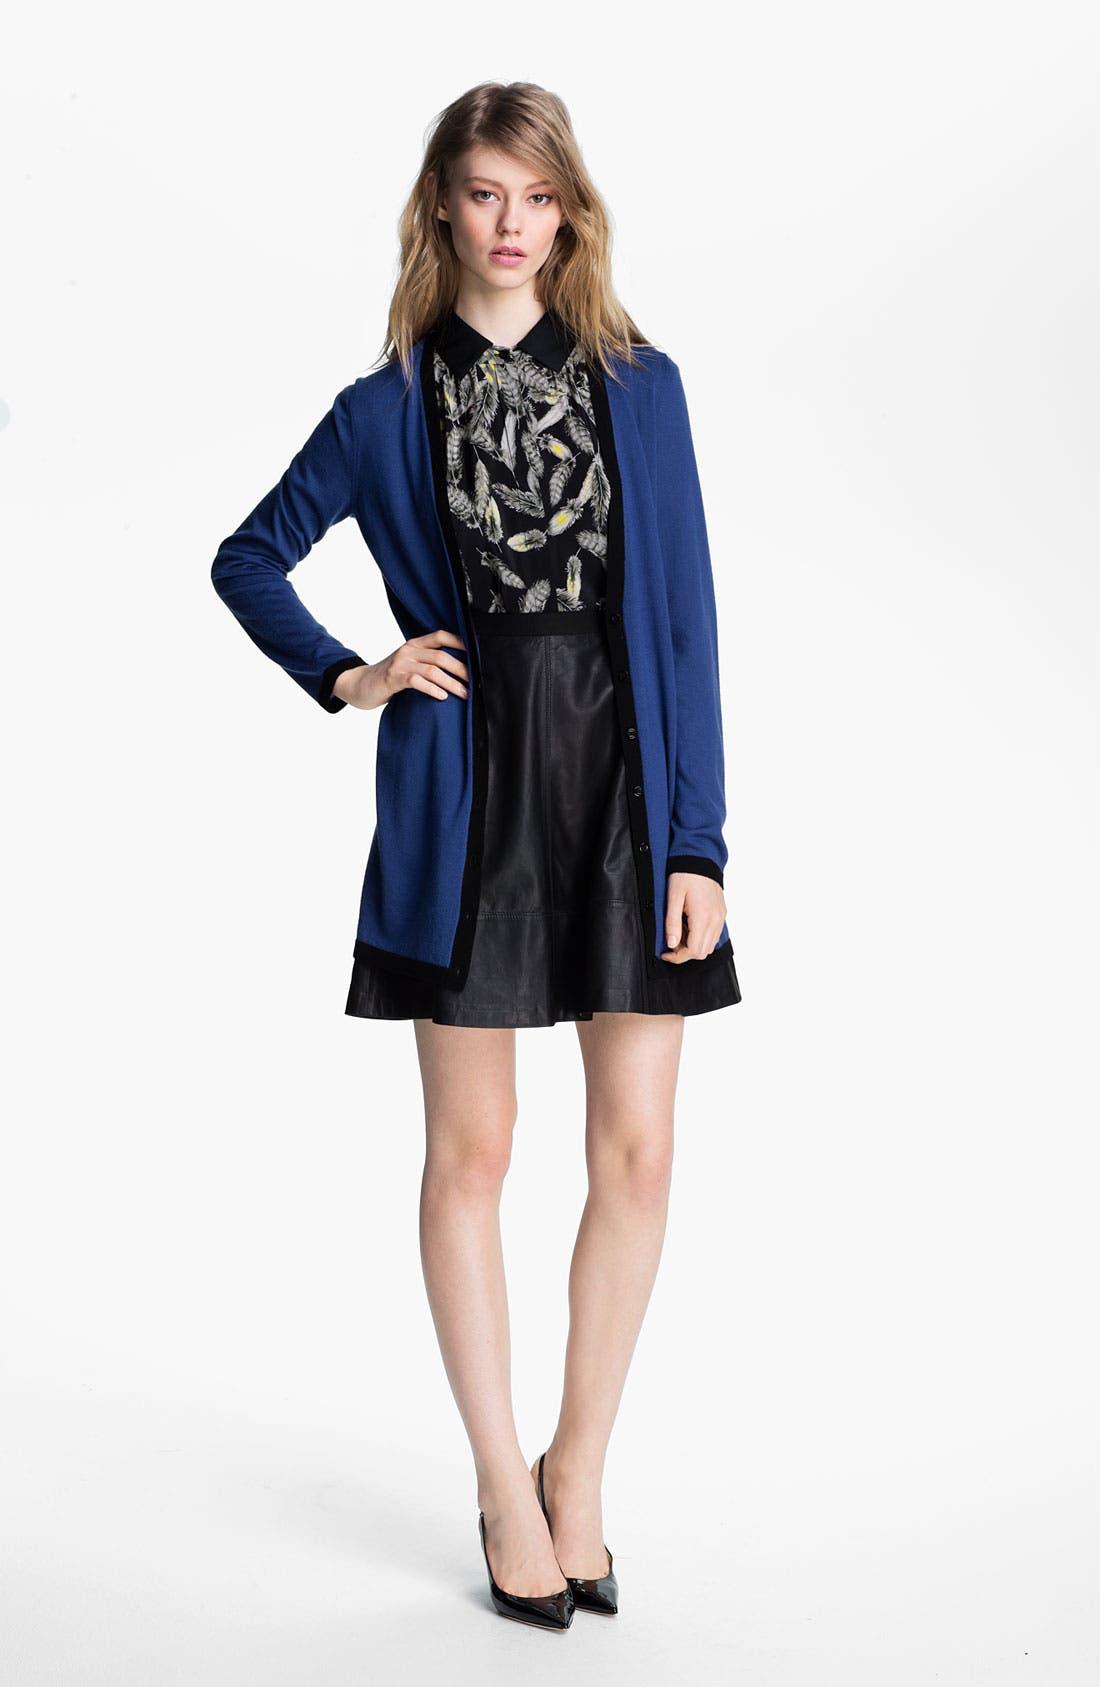 Alternate Image 1 Selected - Miss Wu Cardigan, Blouse & Skirt